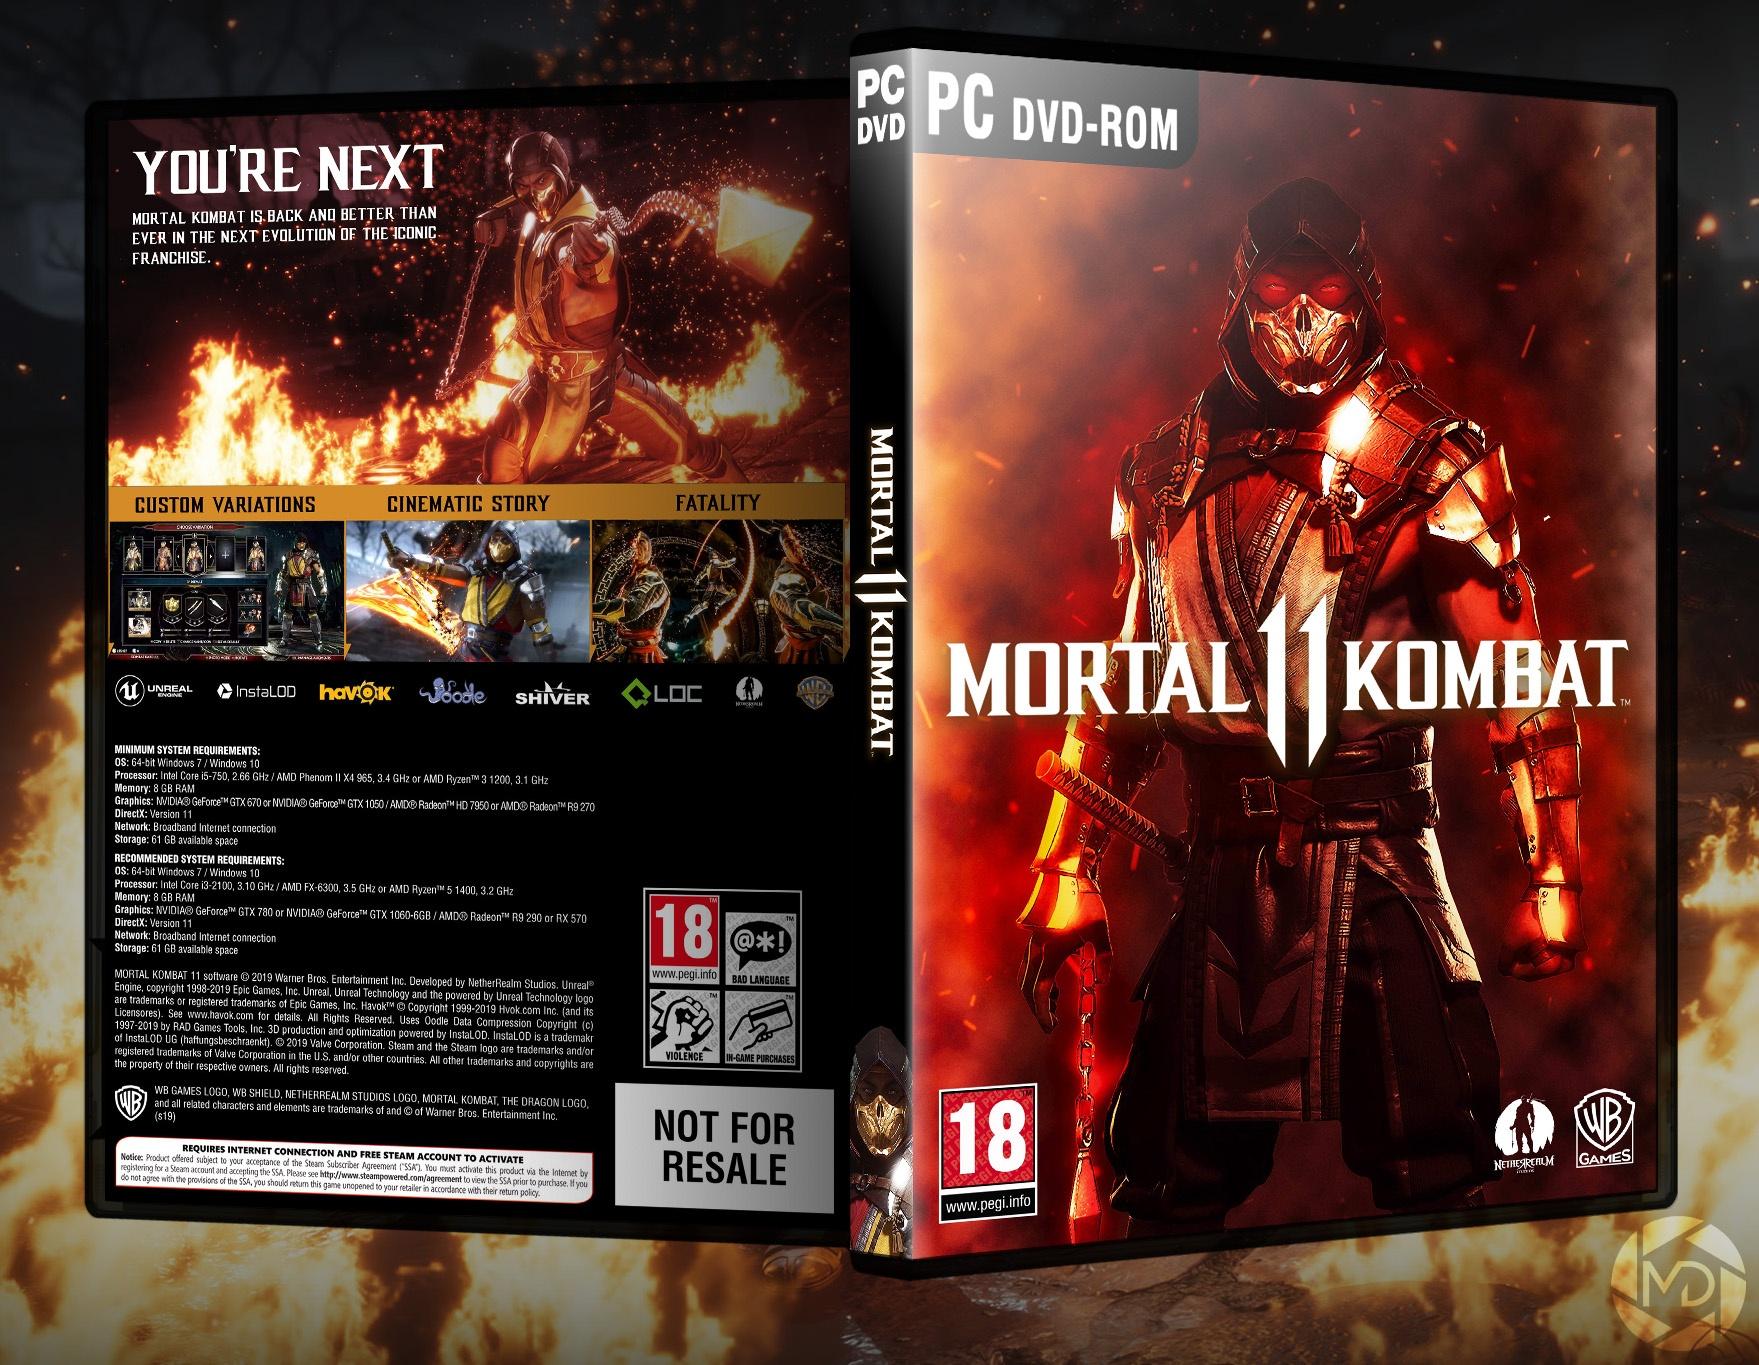 Mortal Kombat 11 PC Box Art Cover by FIRE13spotty